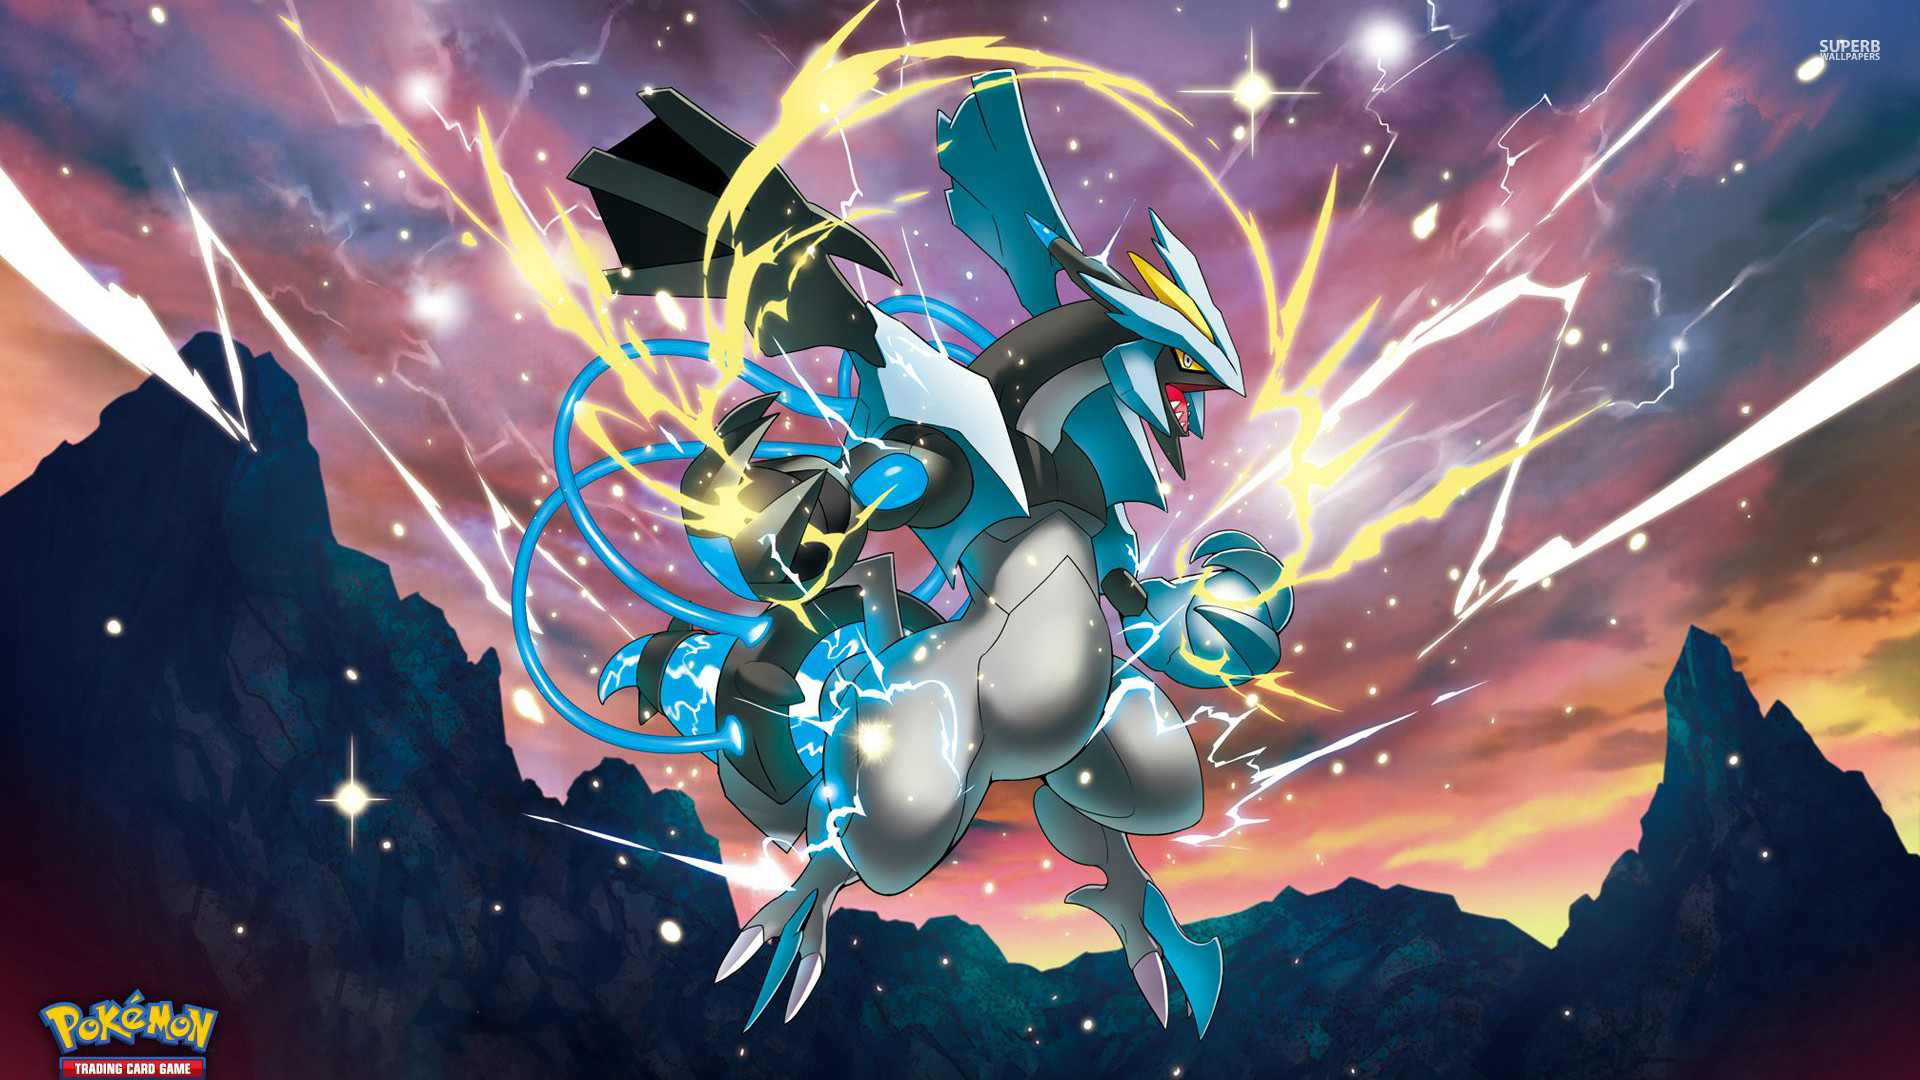 71+ legendary pokemon wallpapers on wallpaperplay